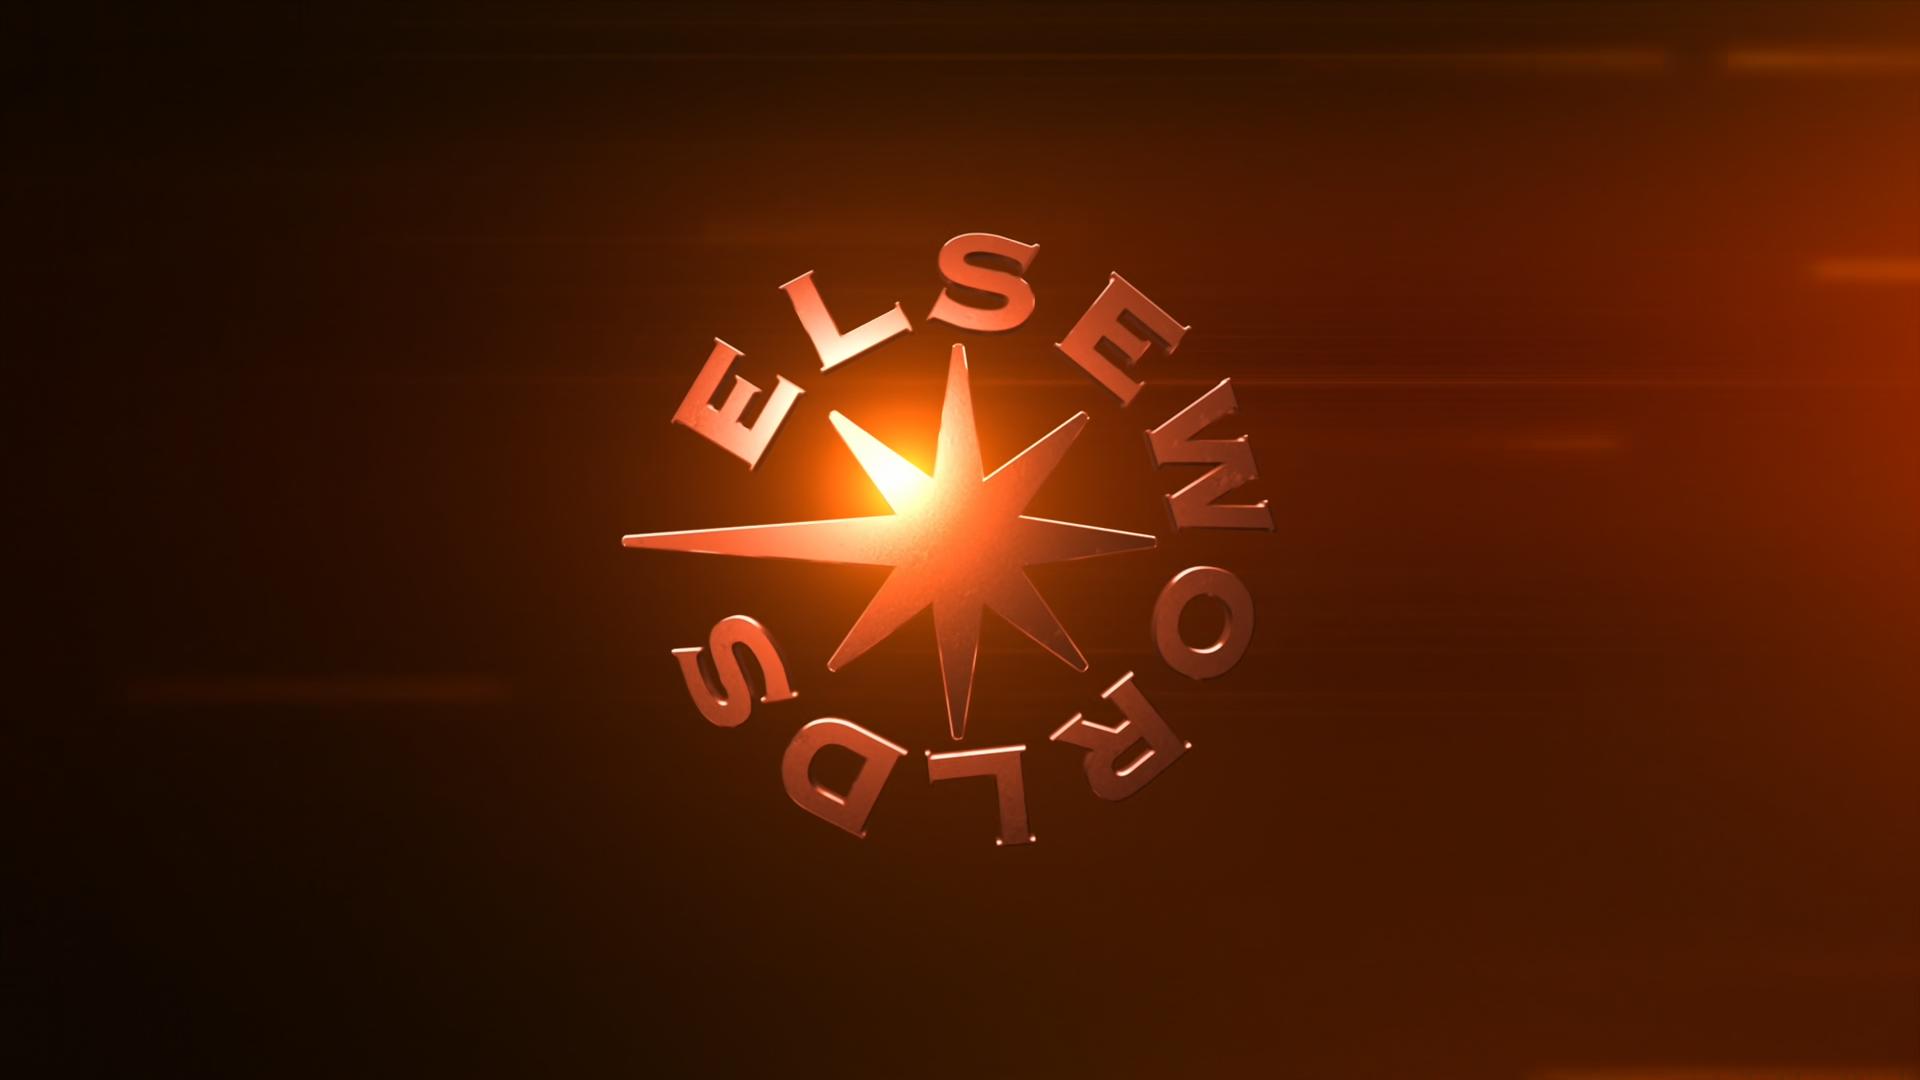 Elseworlds | Arrowverse Wiki | FANDOM powered by Wikia